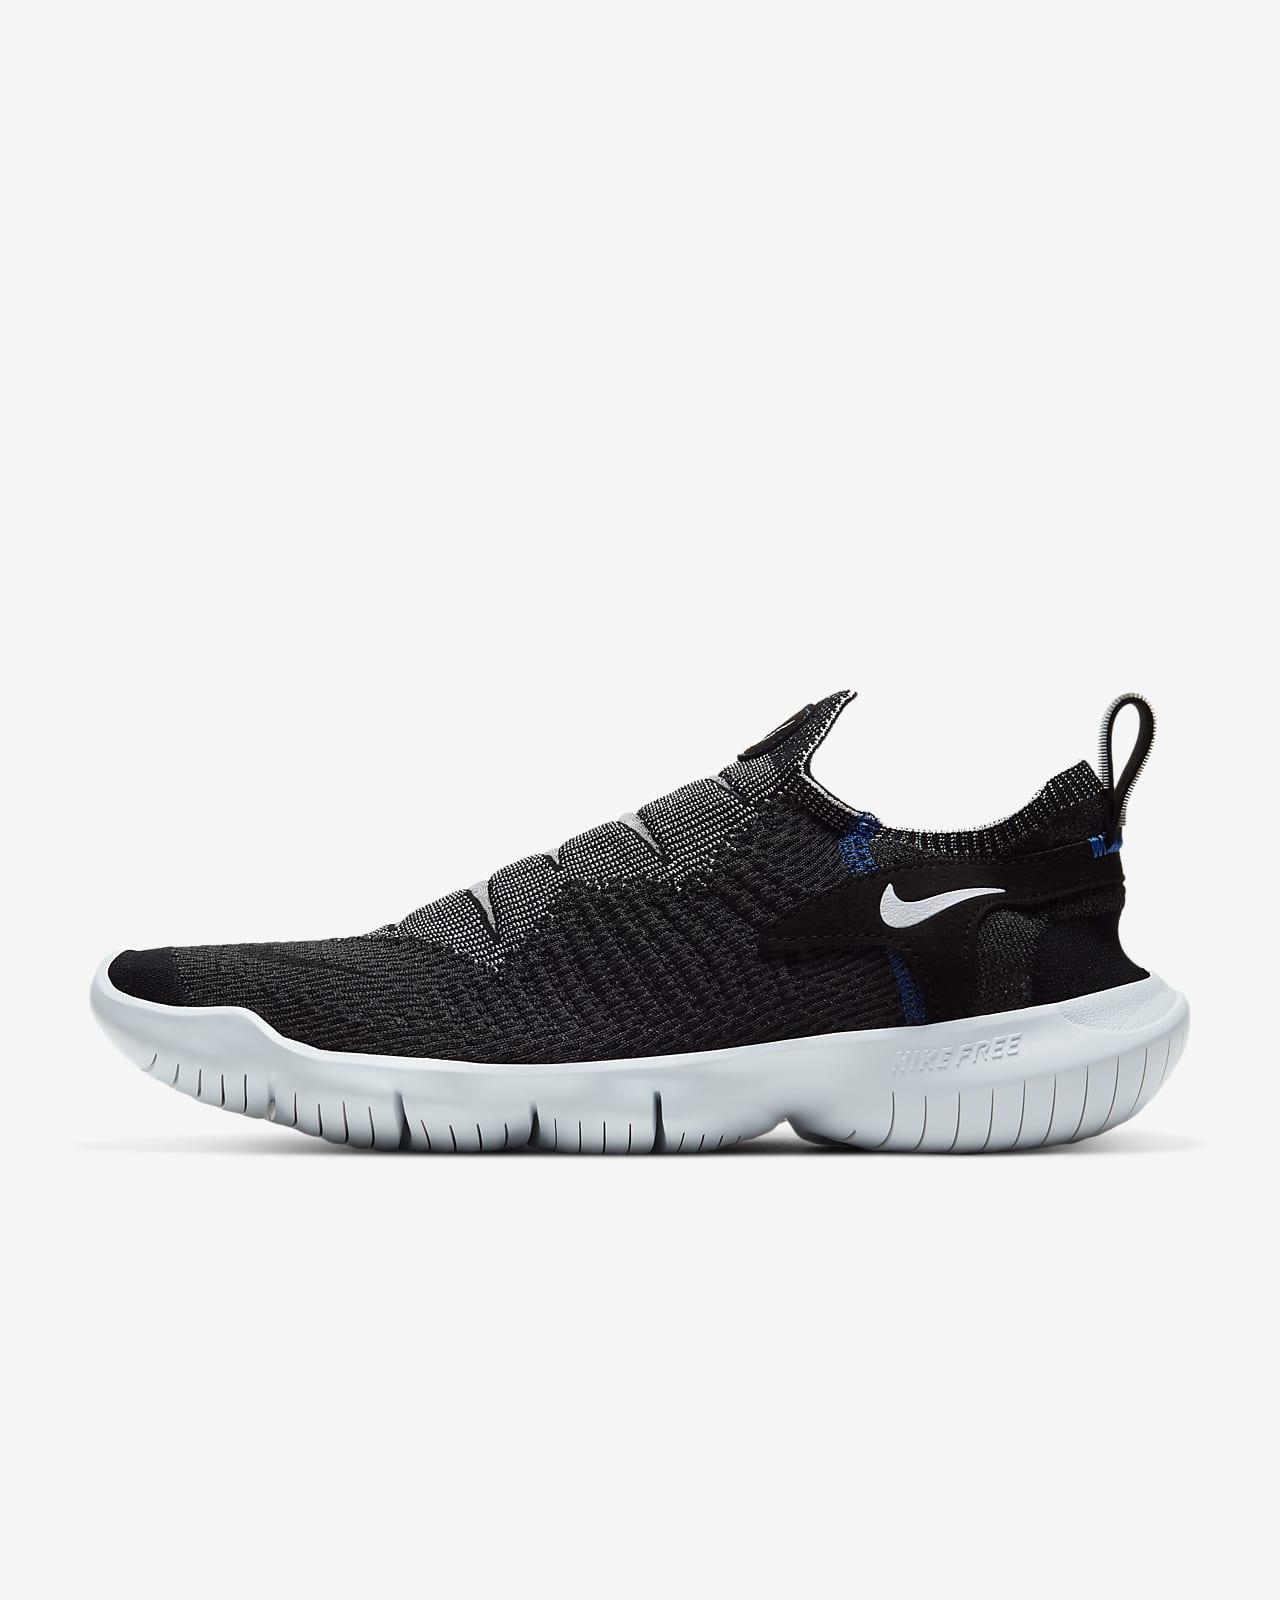 Nike Free Rn Flyknit 3 0 2020 Men S Running Shoe Nike Jp